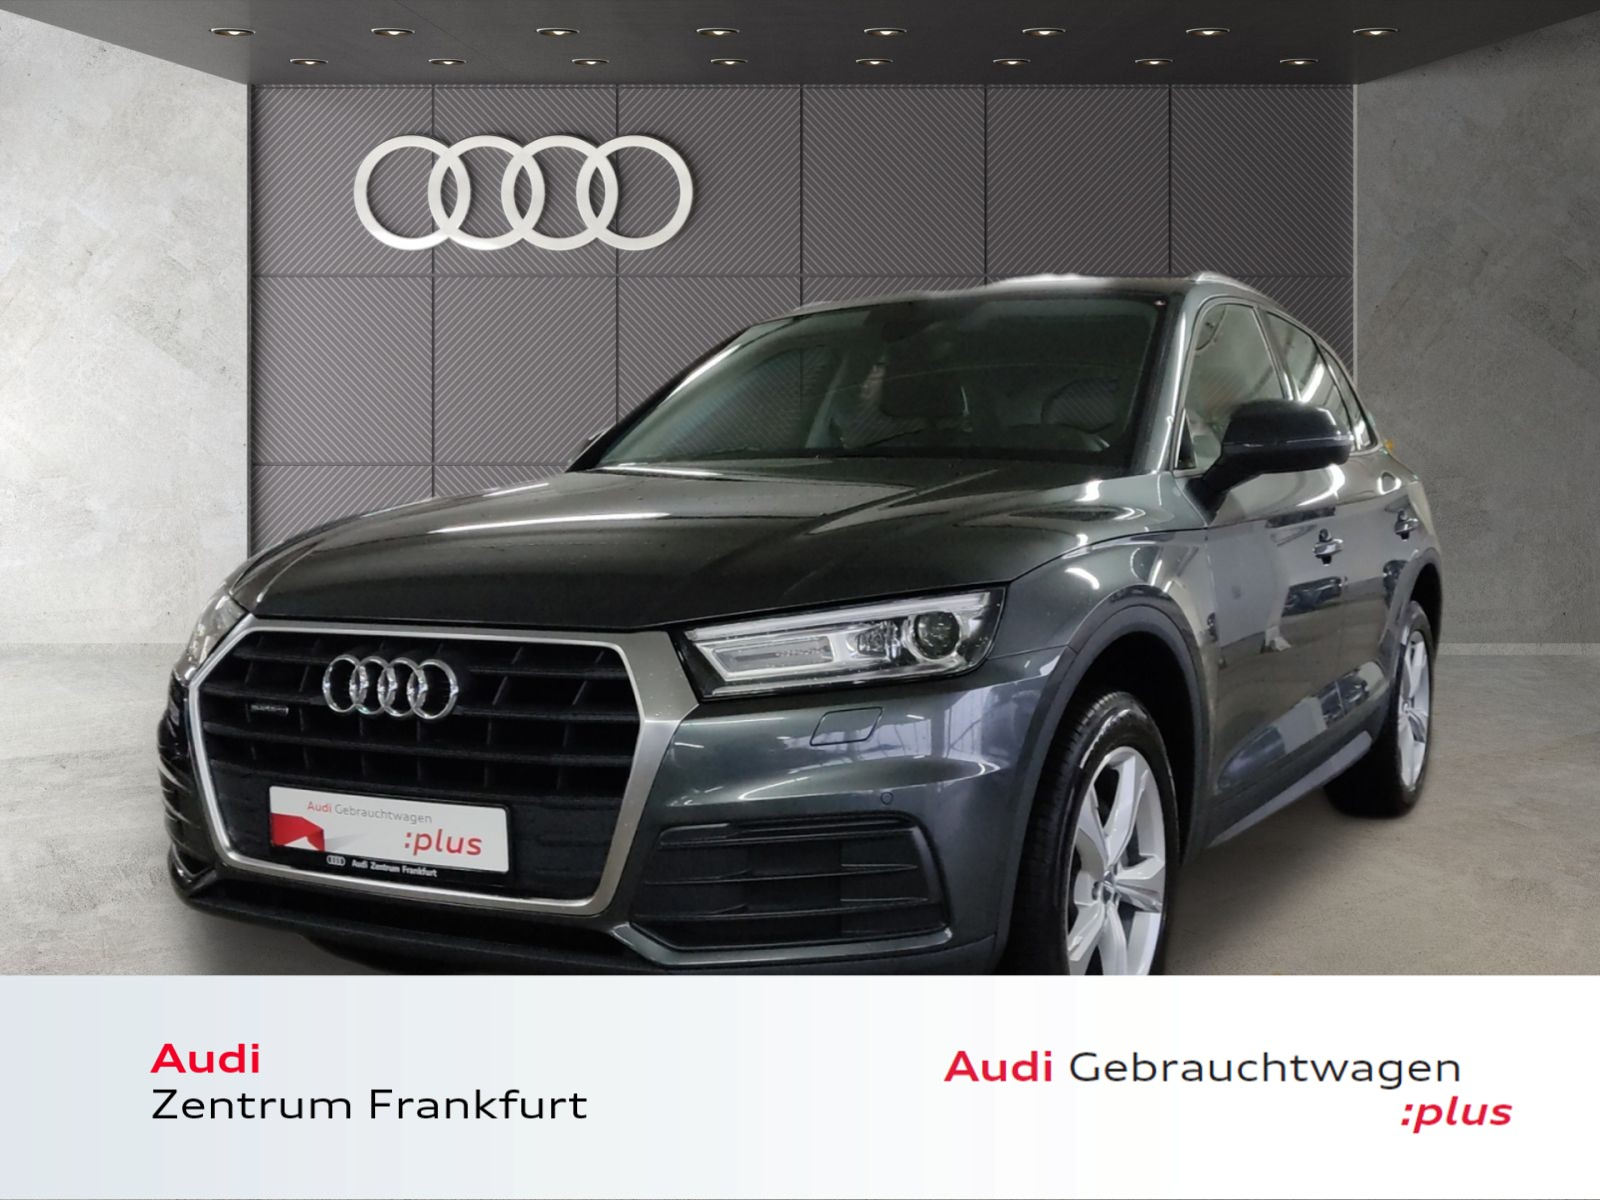 Audi Q5 40 TDI quattro S tronic Xenon AHK Navi PDC Tempomat, Jahr 2019, Diesel